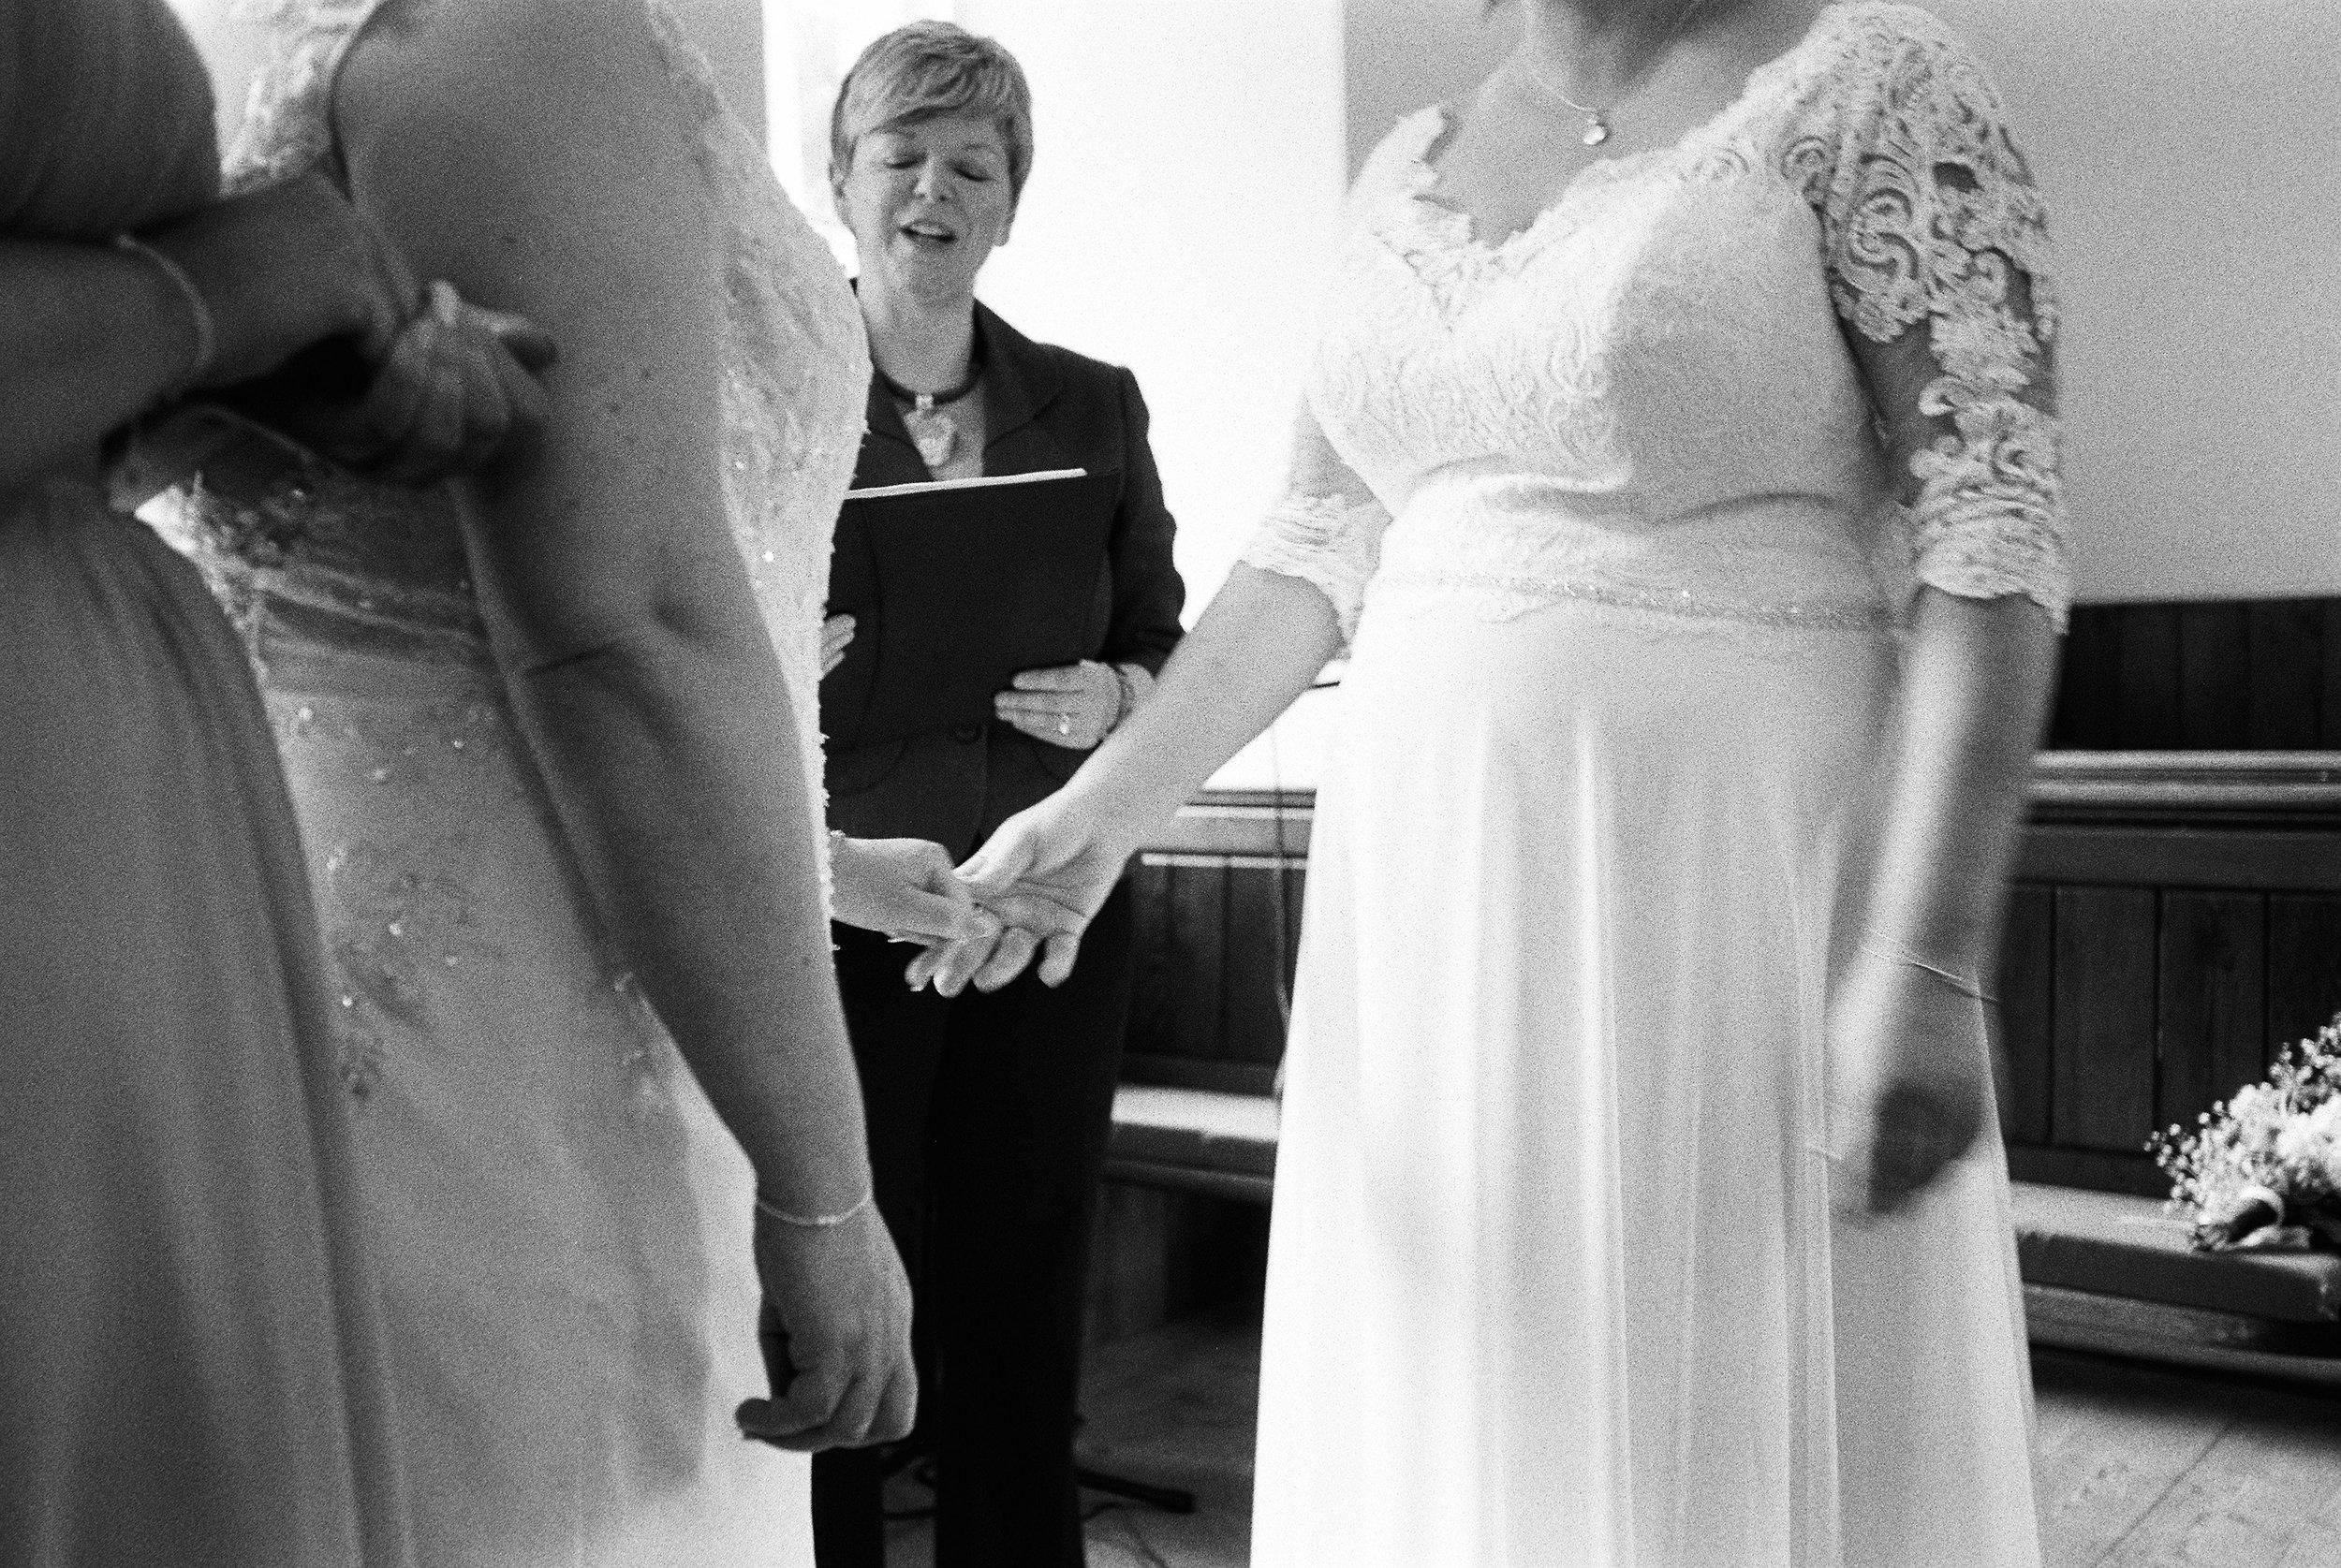 wedding-photography-scotland135.jpg